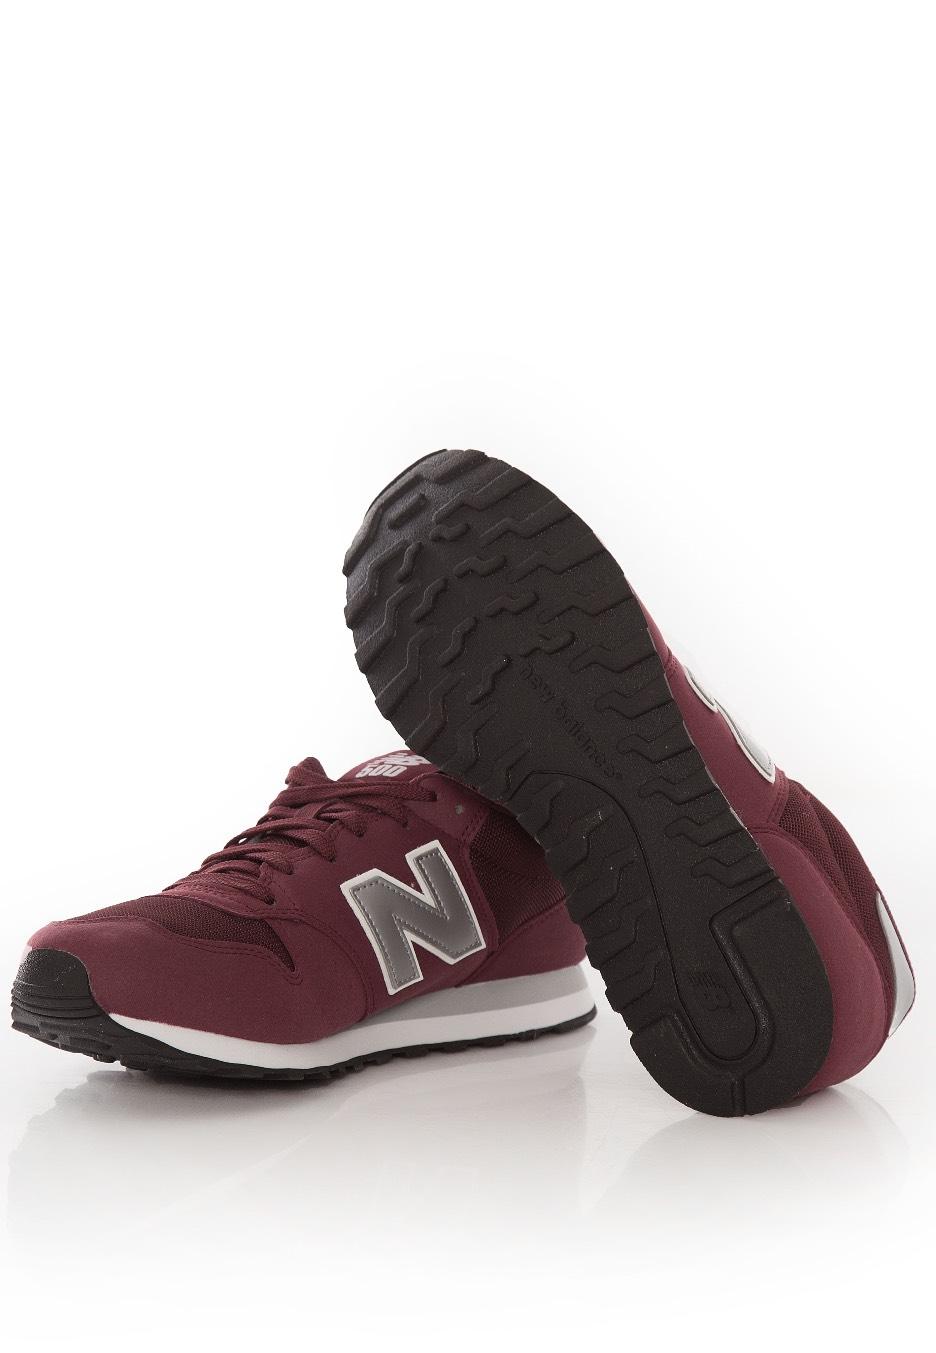 New Balance - GM500 D Burgundy - Shoes